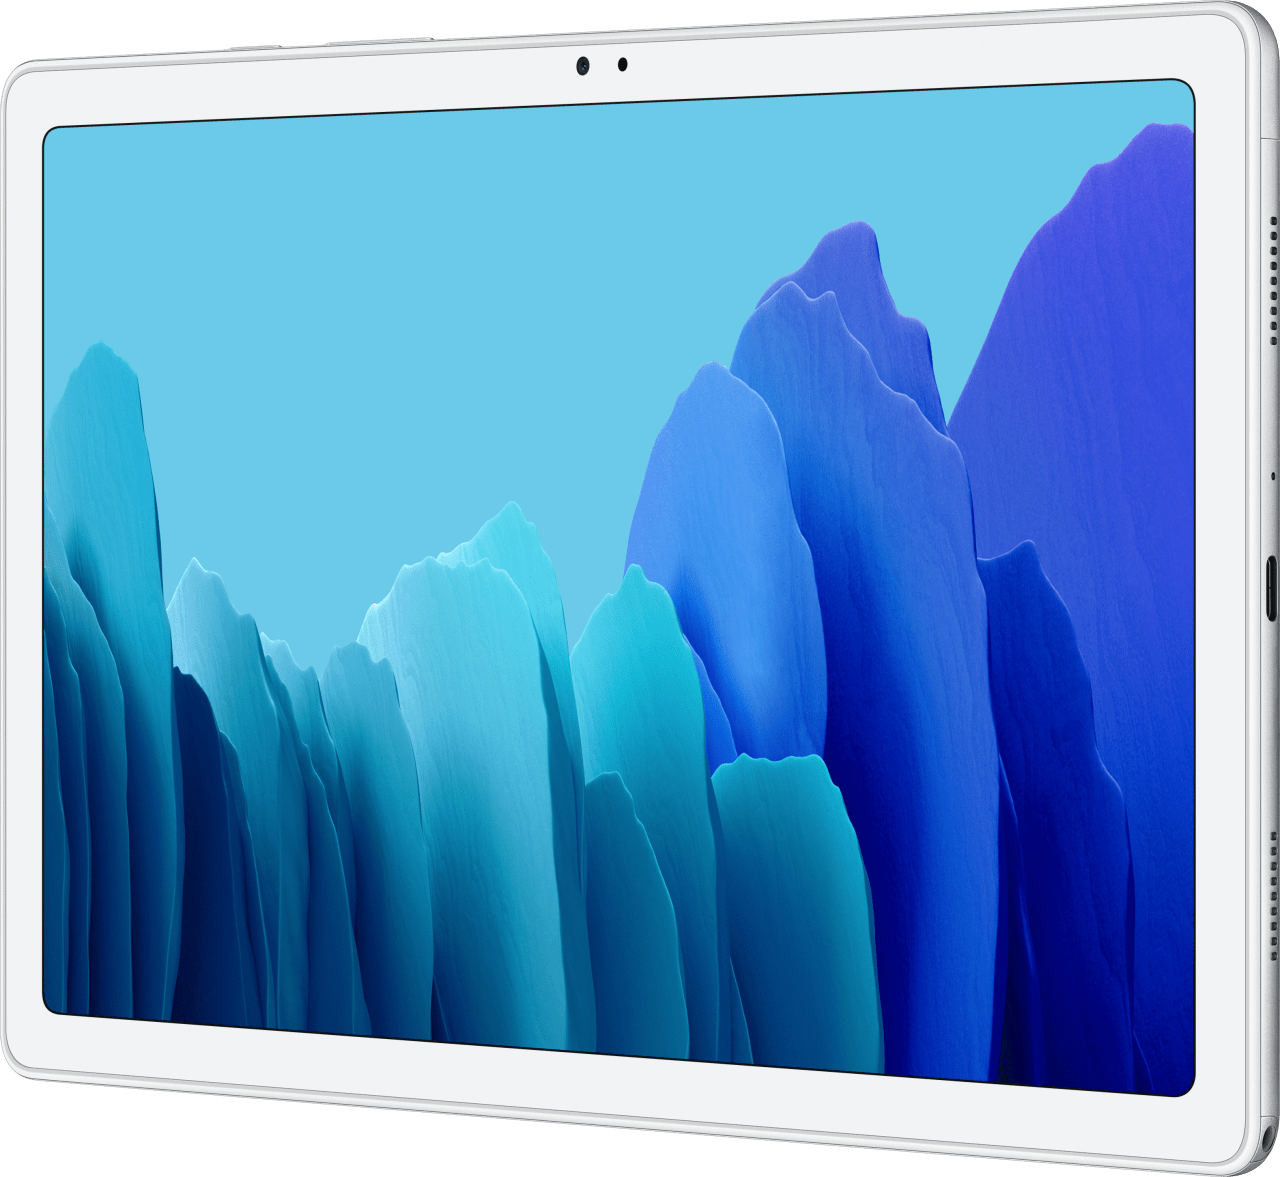 Plata Samsung Tablet Galaxy Tab A7 (2020) - 4G - Android™ 10 - 32GB.3